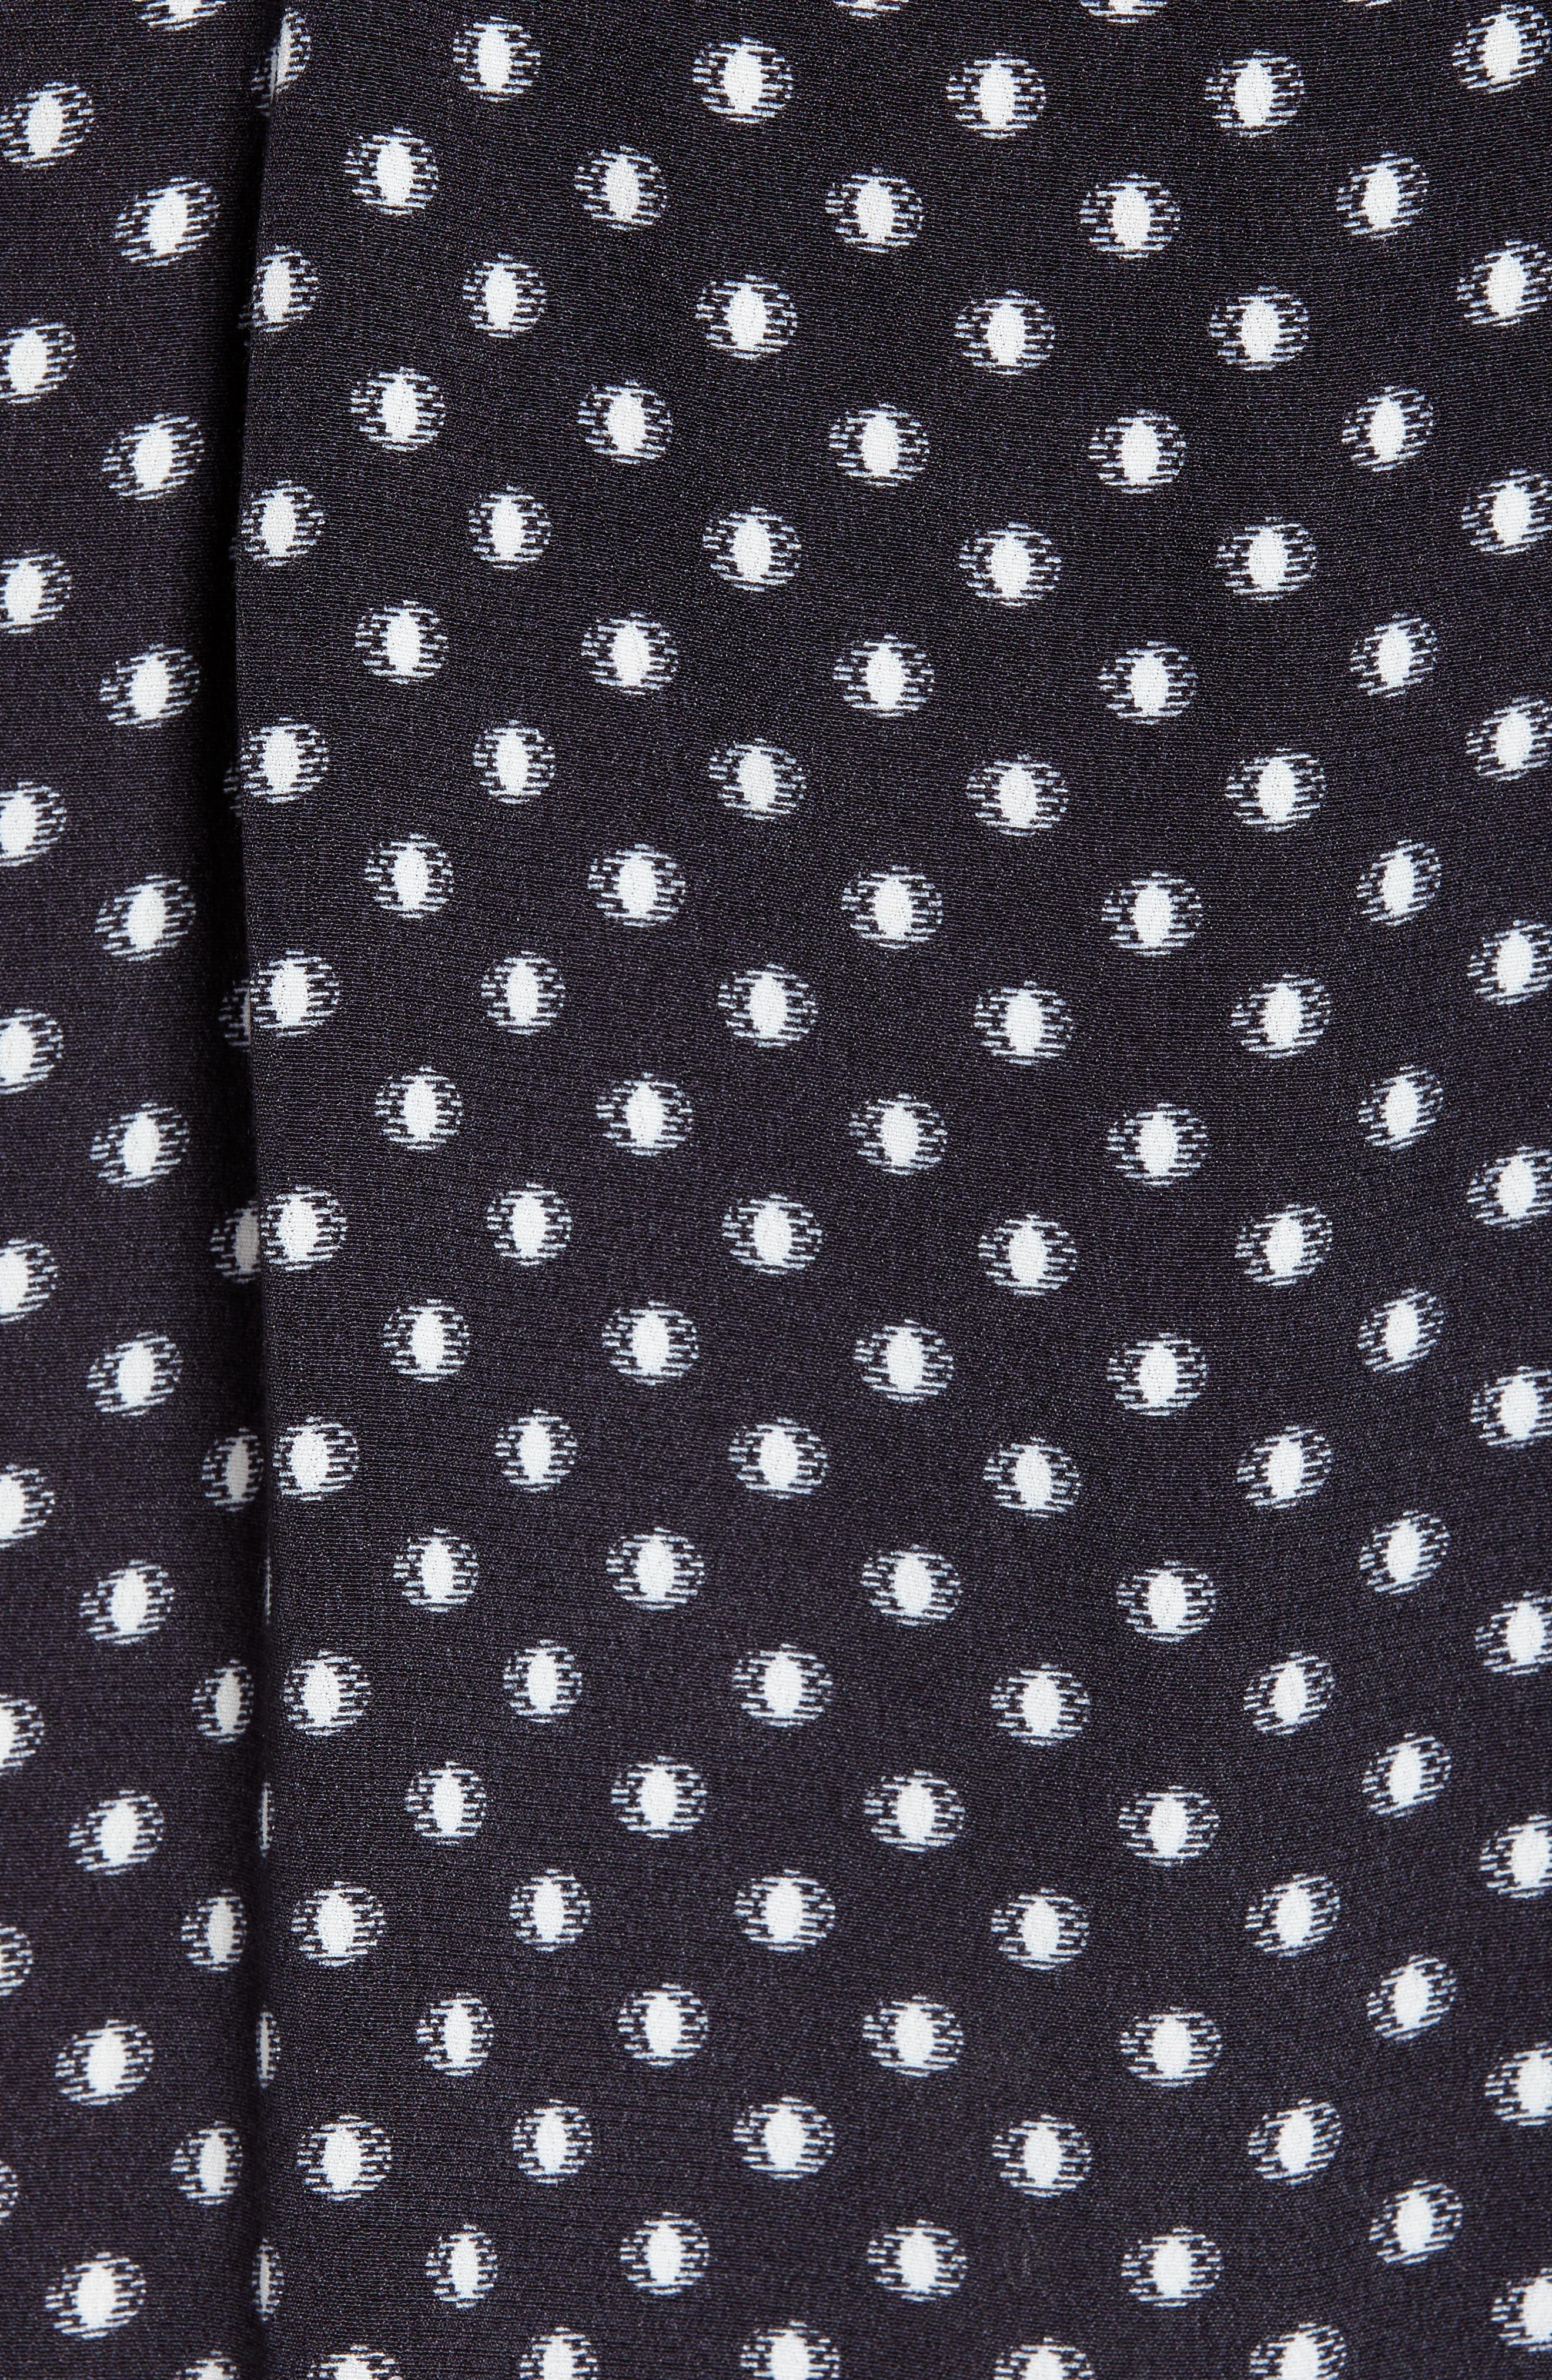 Printed A-Line Dress,                             Alternate thumbnail 6, color,                             BLACK/ WHITE DOT